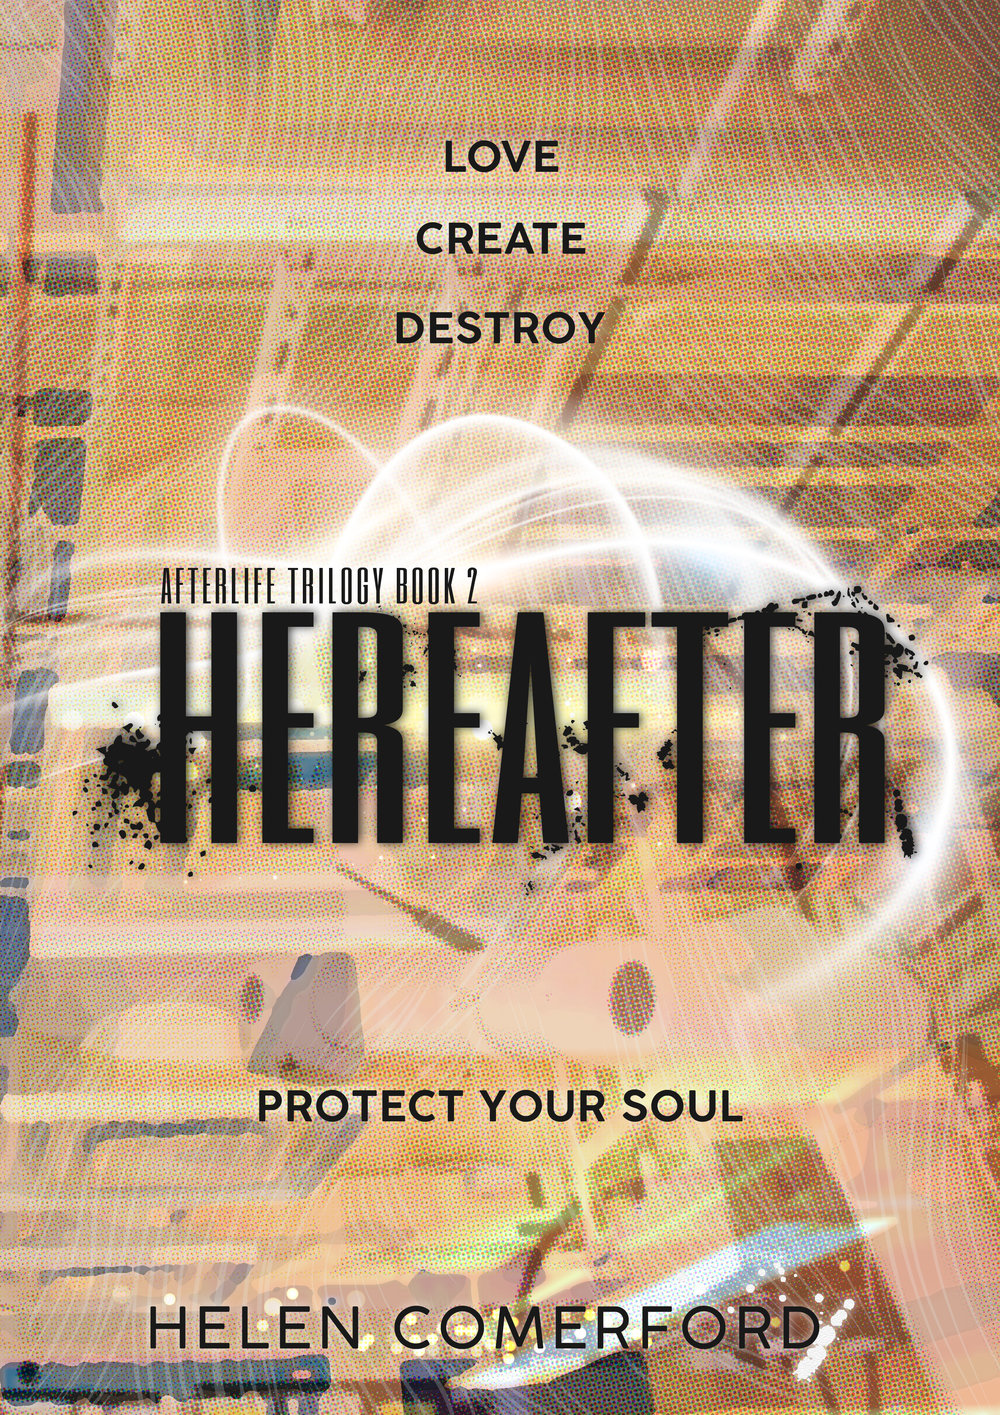 CoverDEF_Hereafter-01.jpg